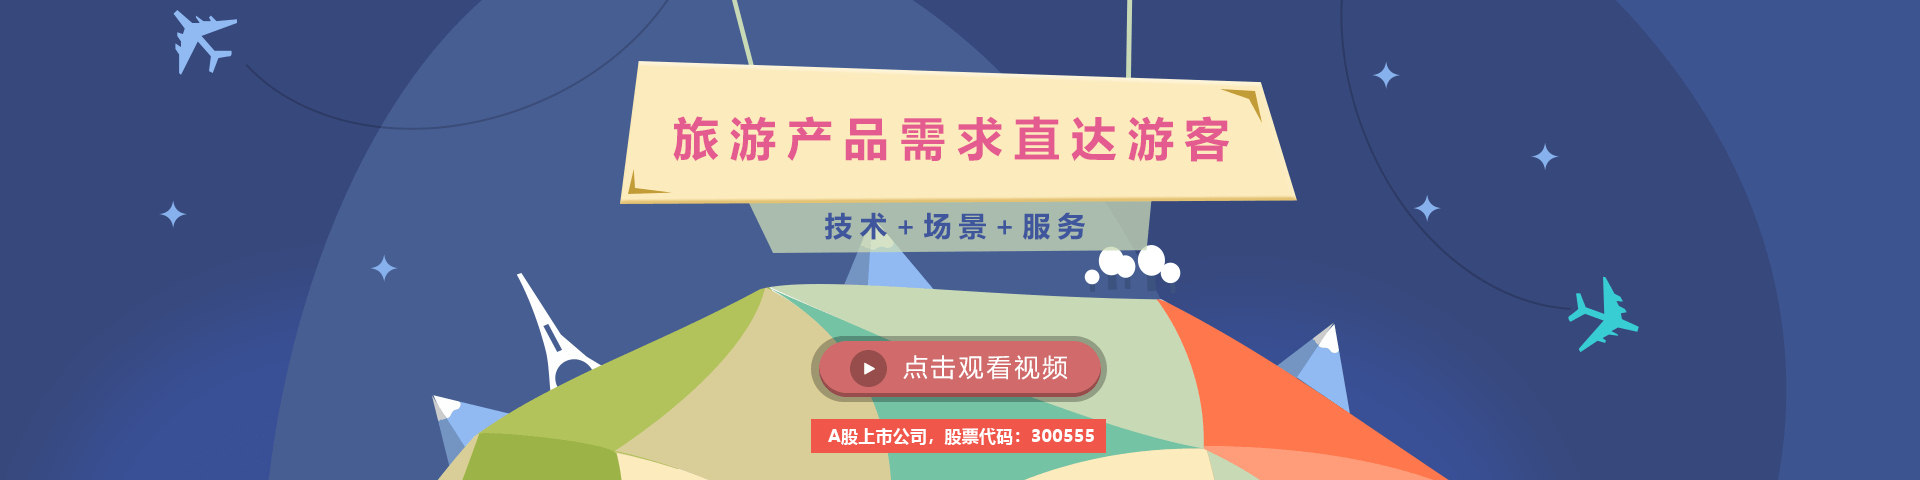 raybet雷竞物联智慧旅游